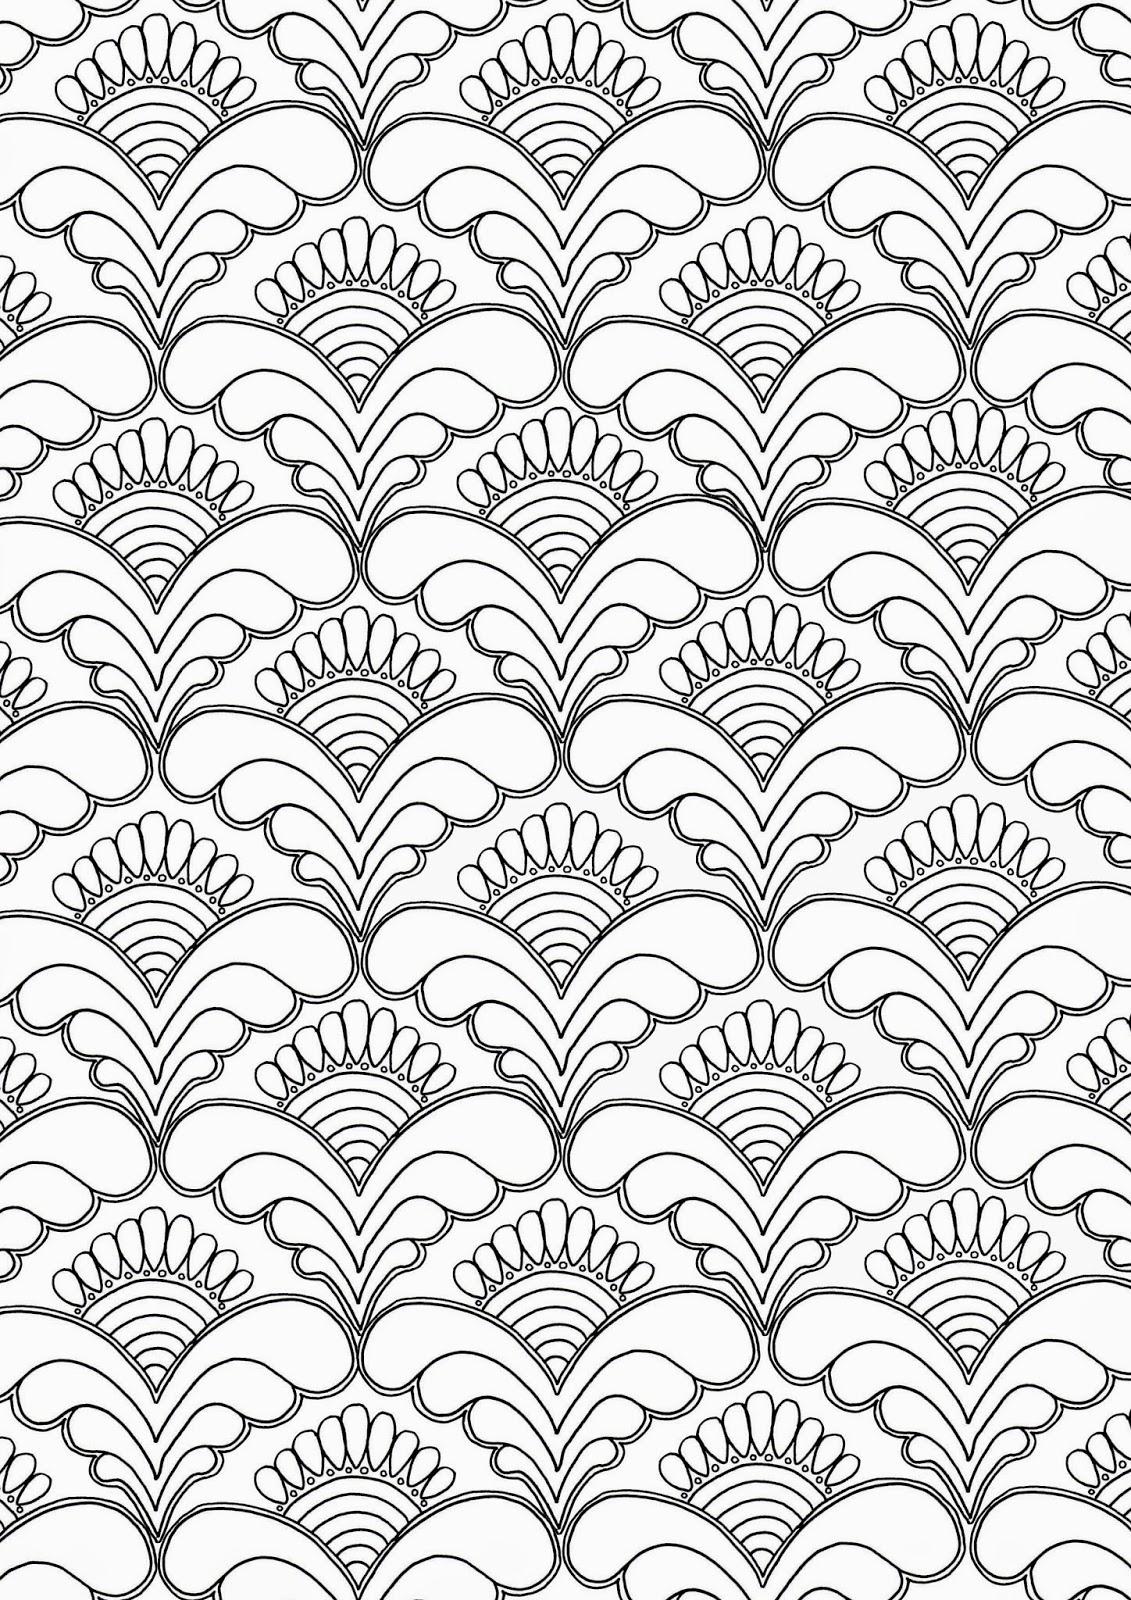 JESSICA ROSE ANNE ILLUSTRATION: Wallpaper book designs